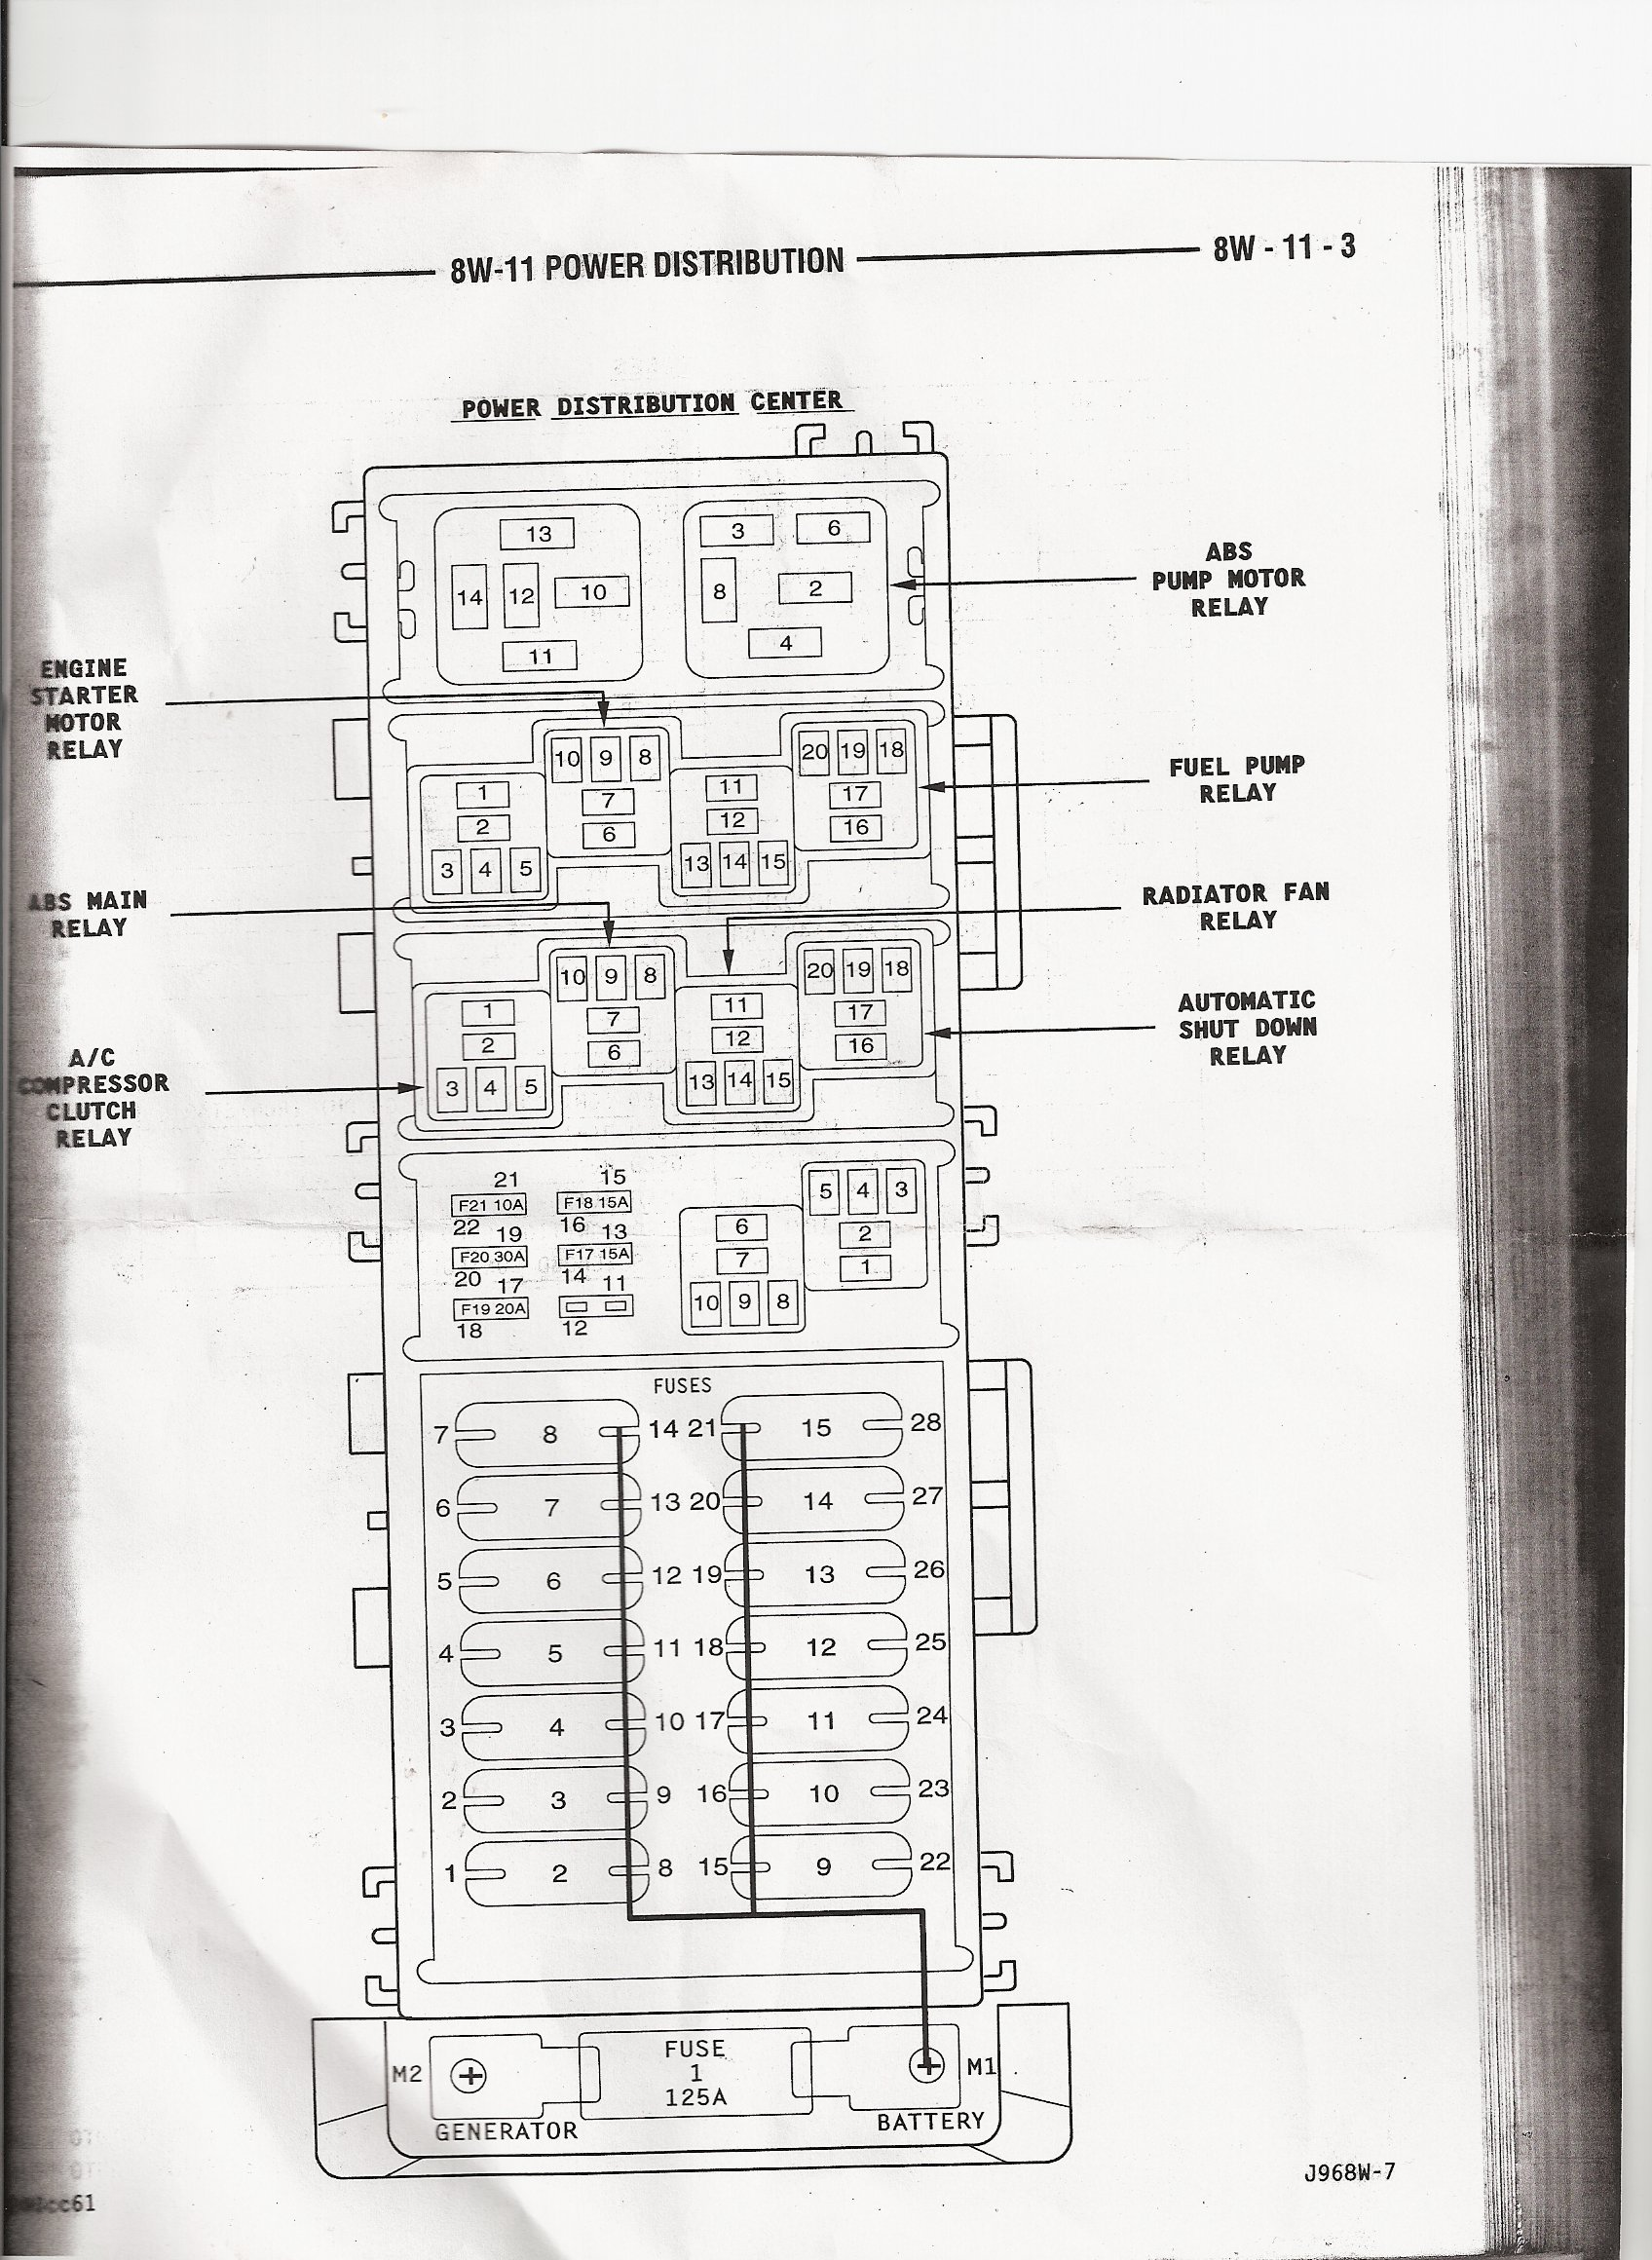 [EQHS_1162]  ME_3740] 2001 Jeep Grand Cherokee Driver Side Fuse Box Schematic Wiring | Infiniti G35 Fuse Box Diagram Driver Side |  | Pneu Heli Xeira Mohammedshrine Librar Wiring 101